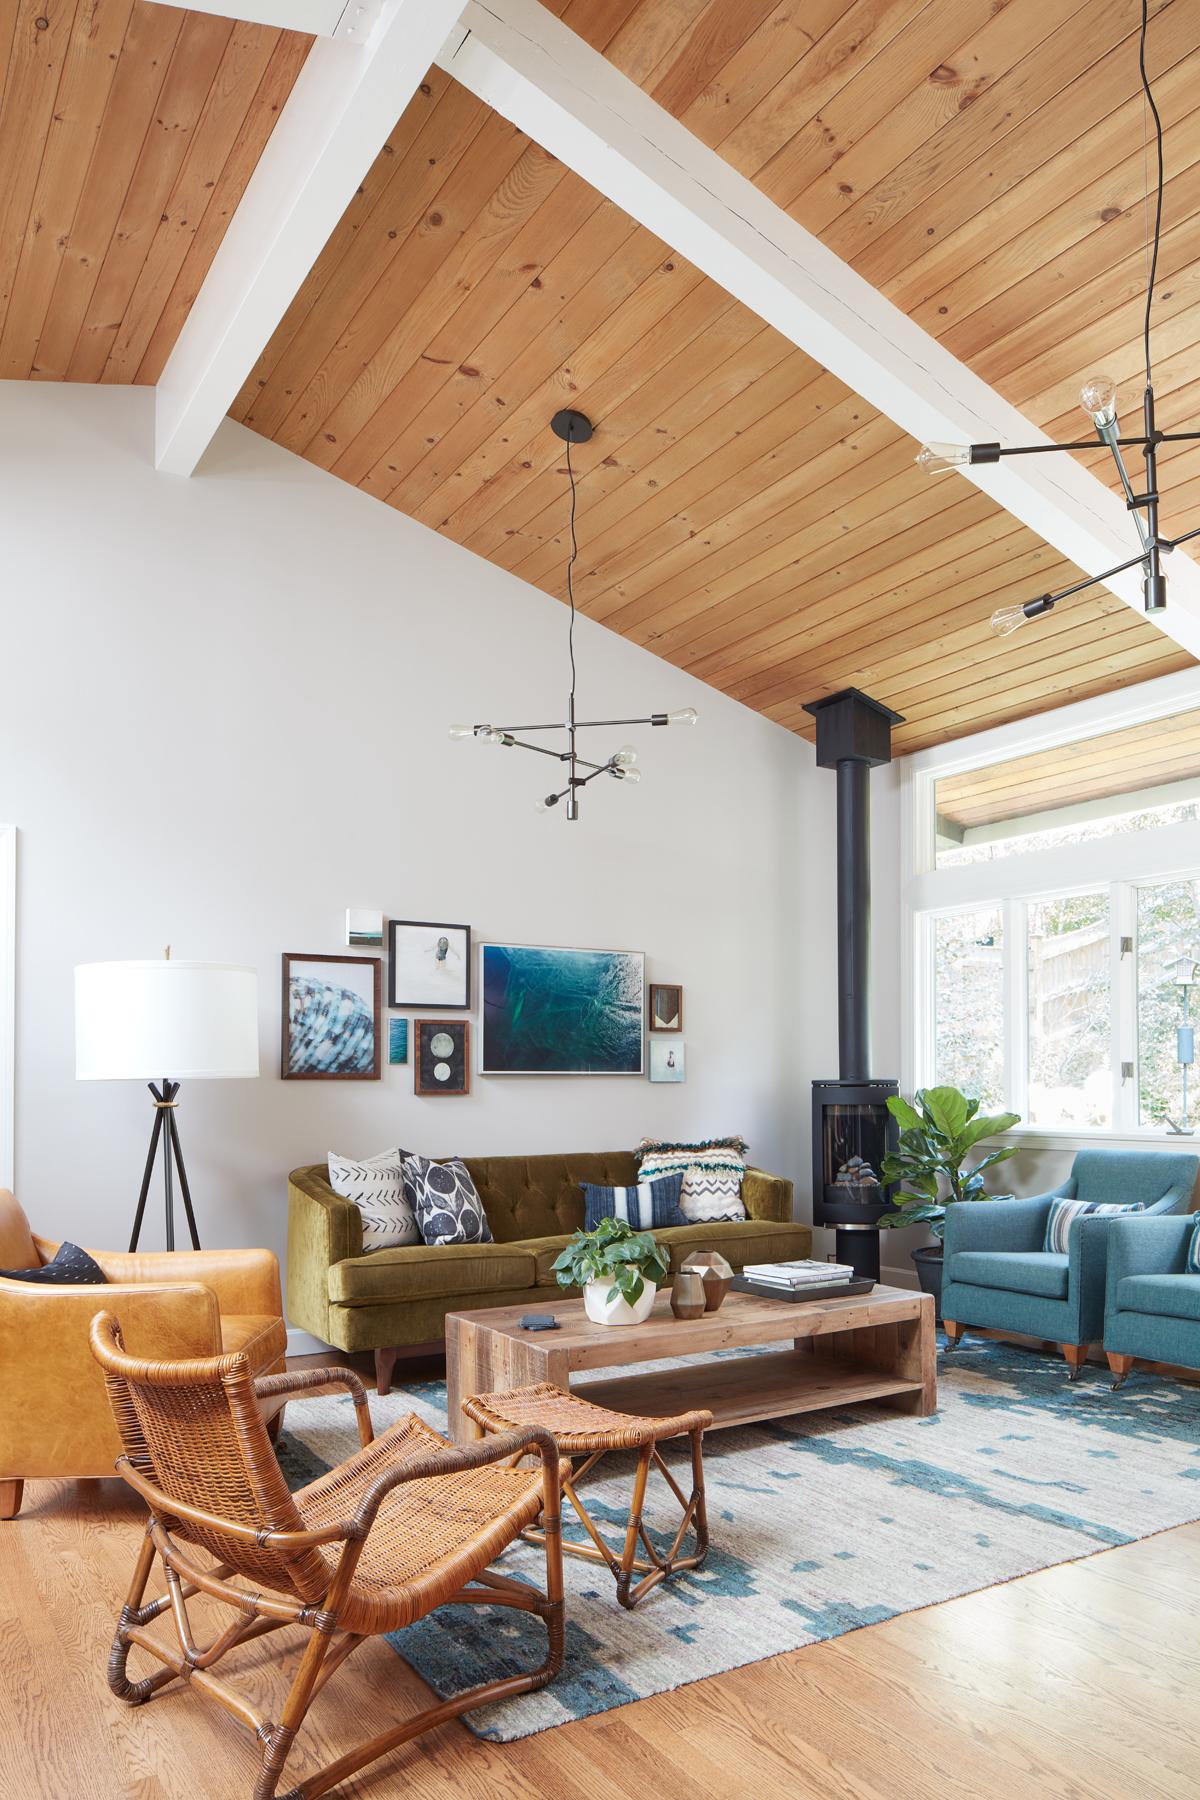 Interior design by Kristina Crestin Design